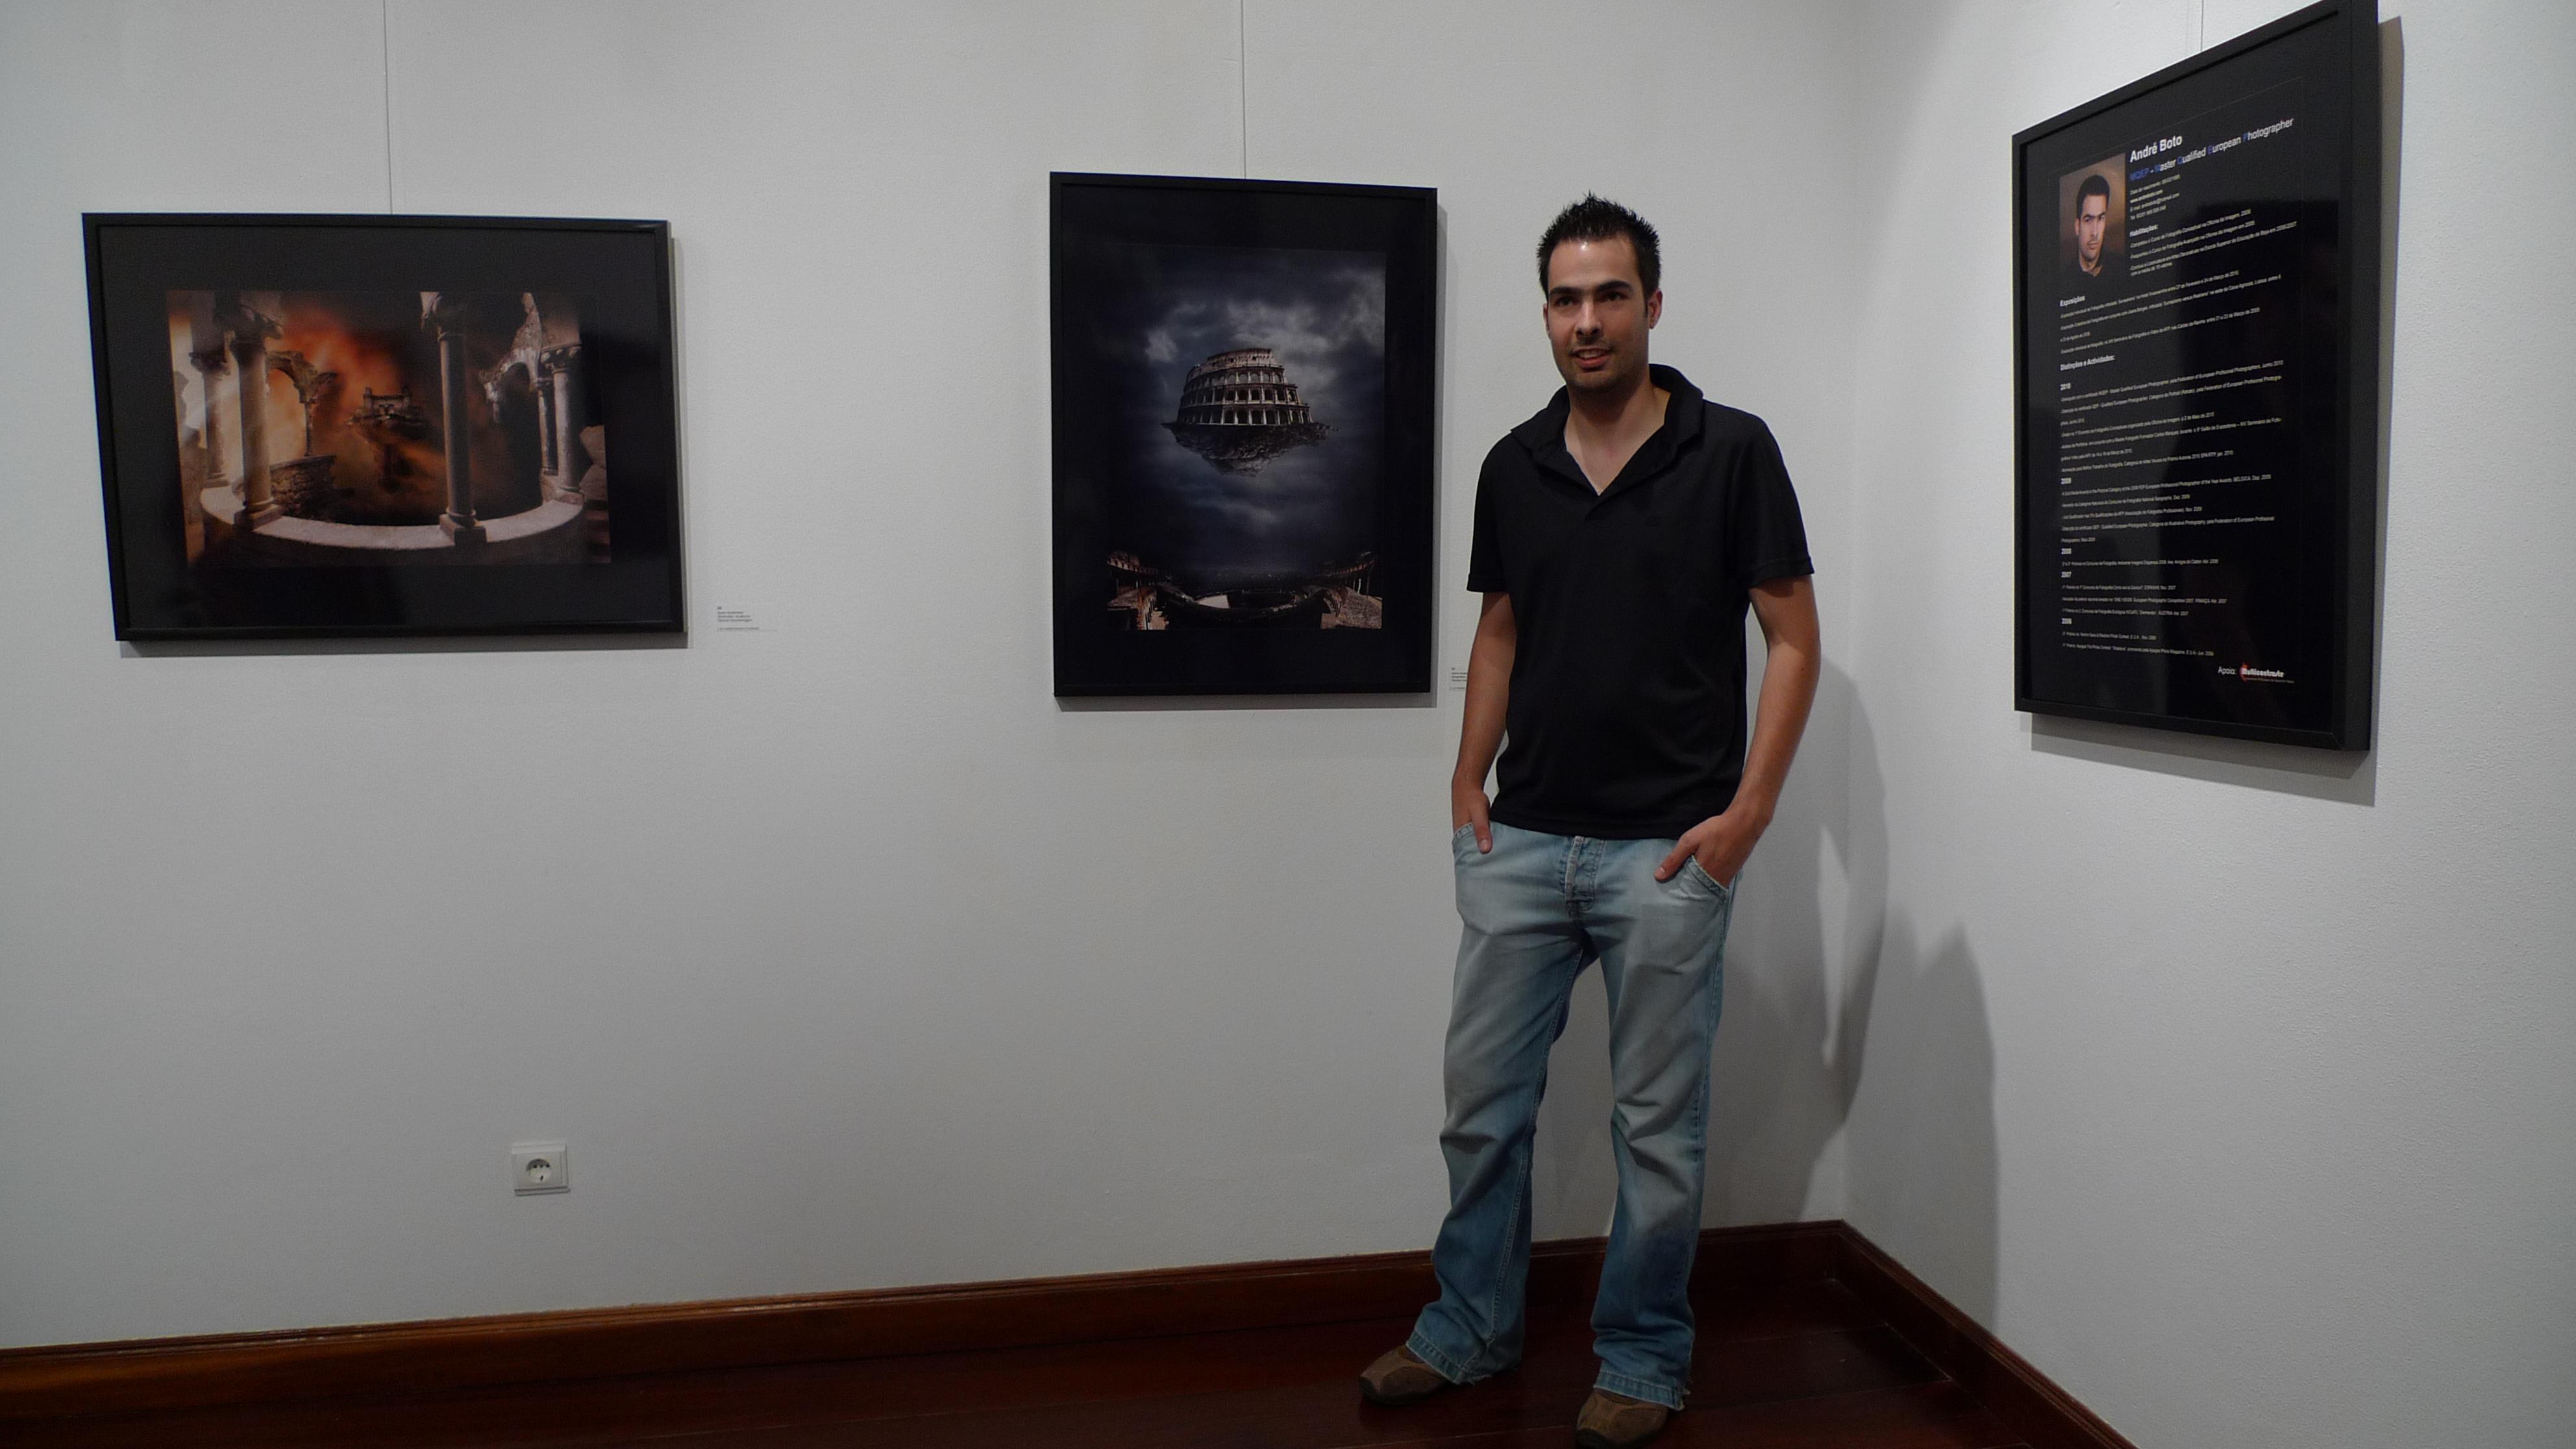 2010 - Surrealismo